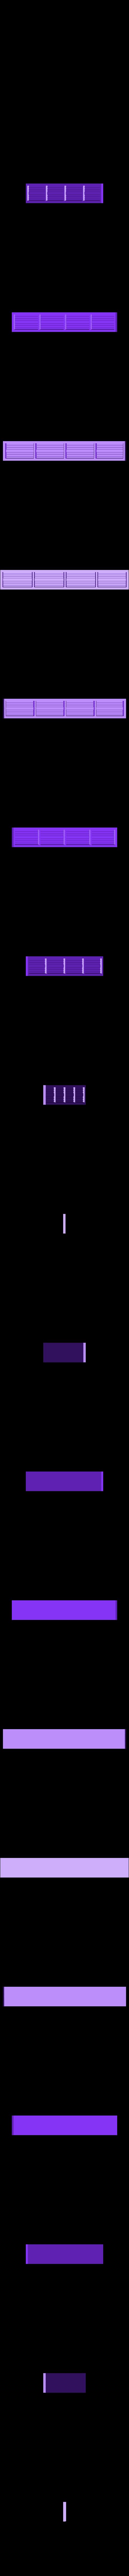 G Ridelle2.STL Download STL file Draisine Matisa for LGB • 3D printable object, biddle